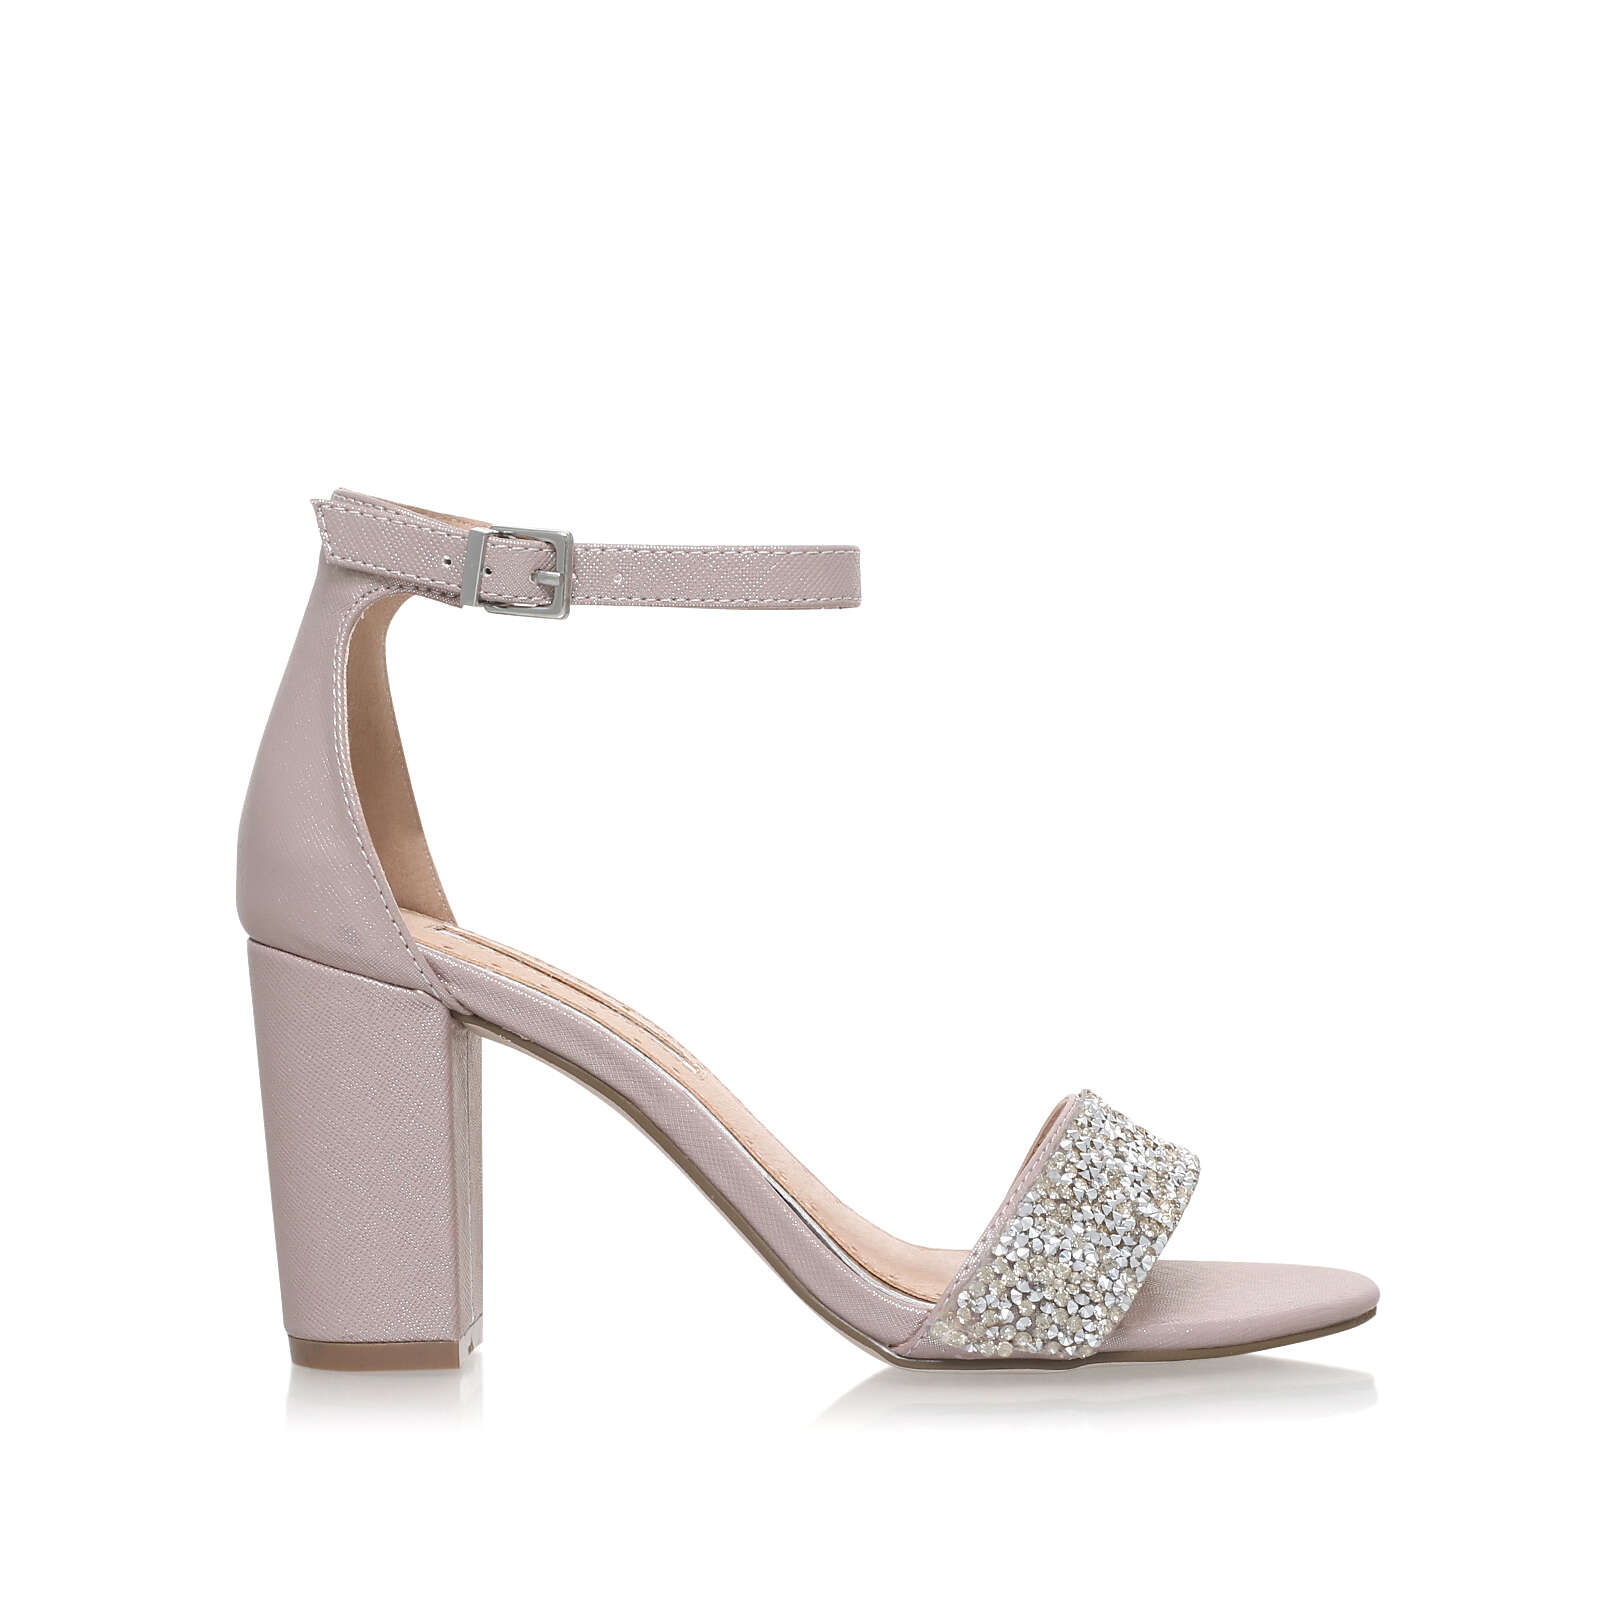 CADEY Miss KG Cadey Pale Pink Mid Heel Sandals by MISS KG